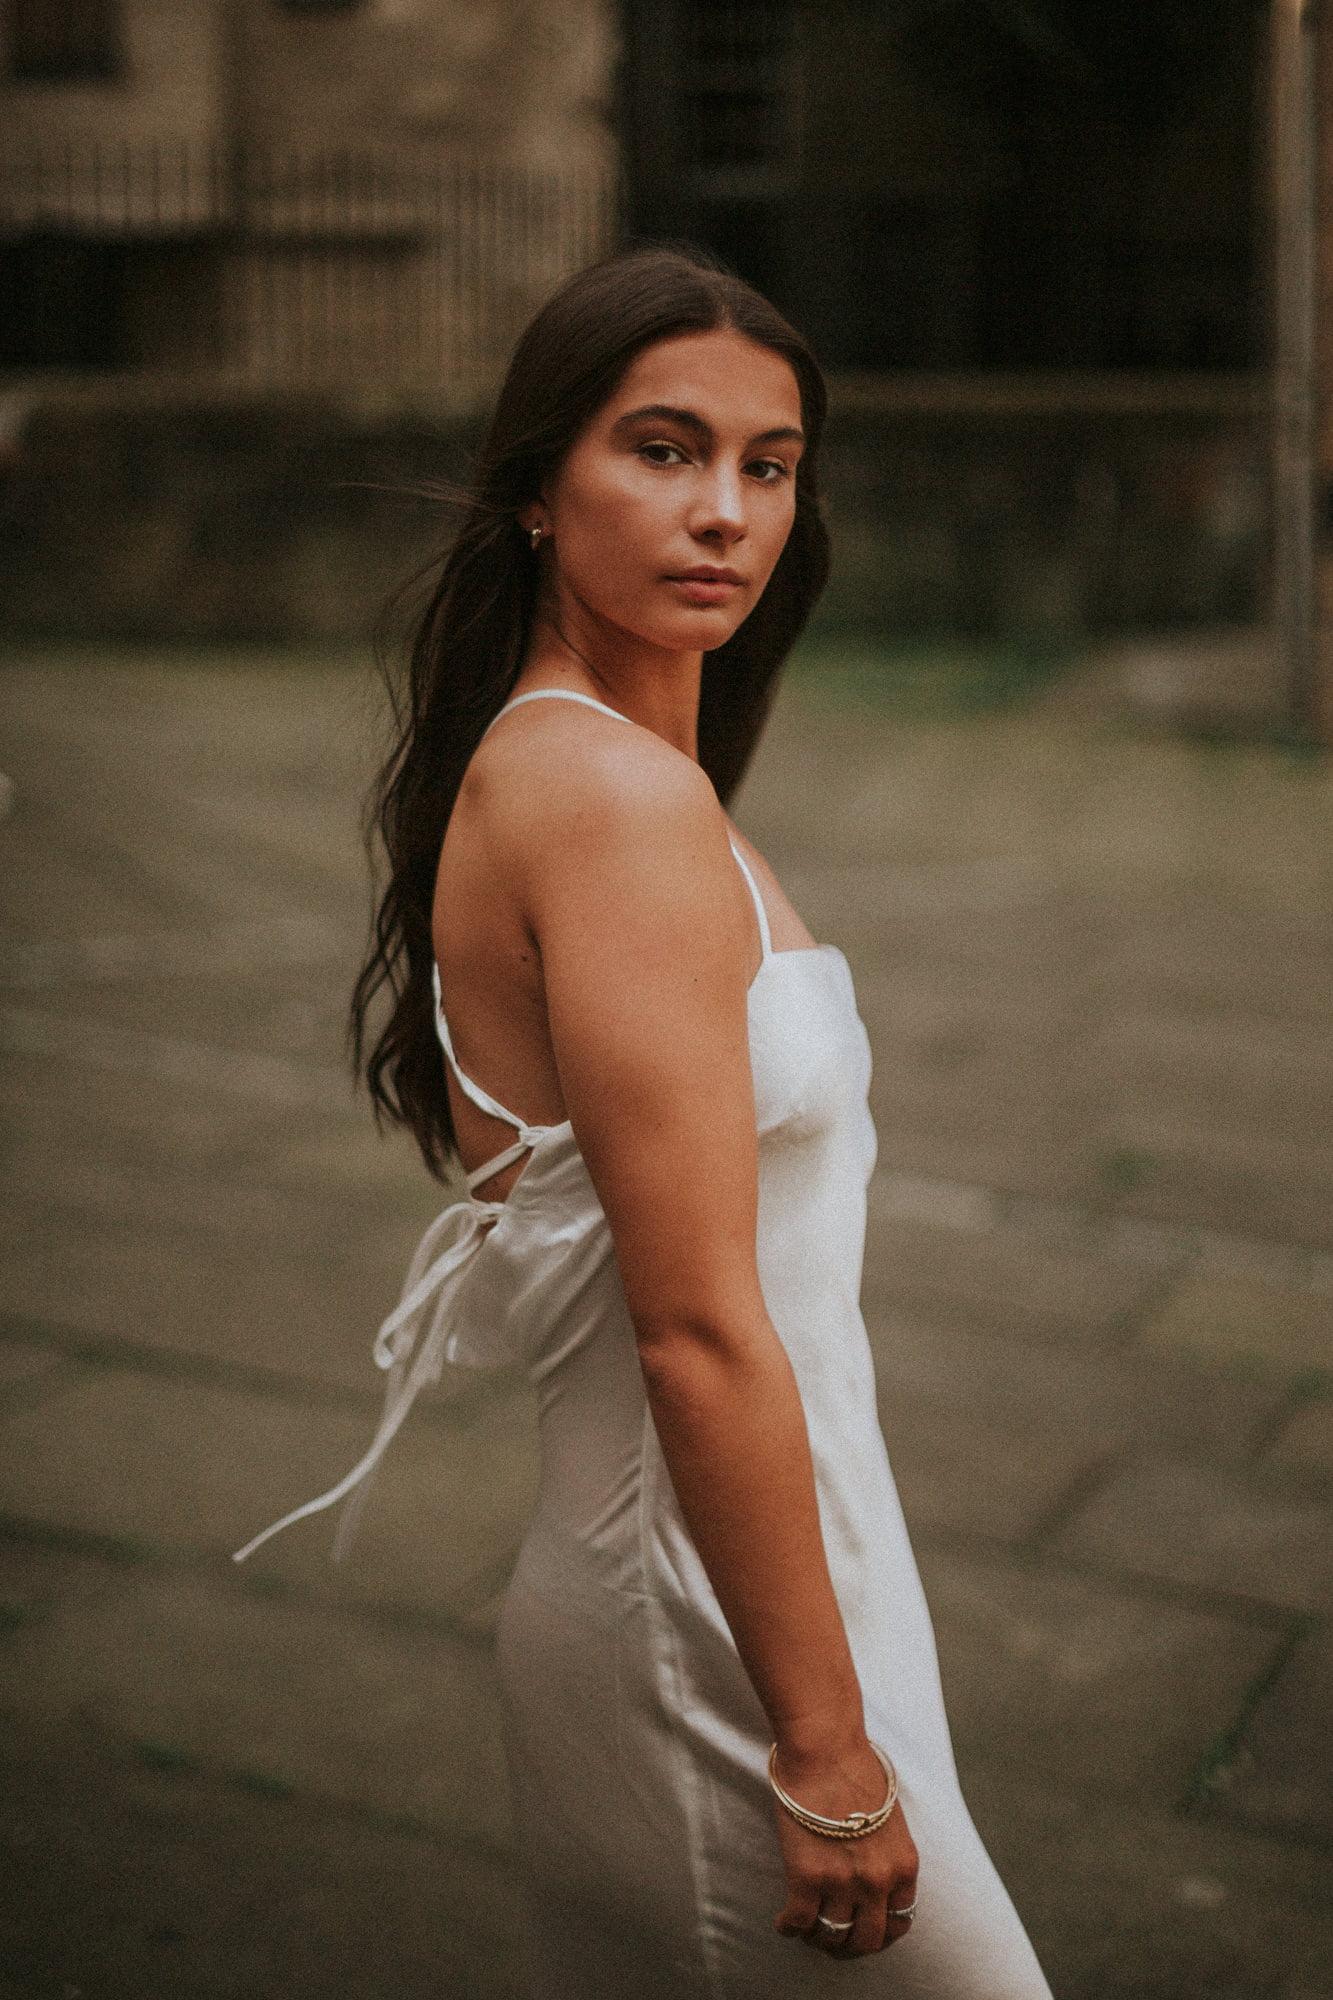 Delhi, Tartan Models - Edinburgh Fashion and Product Photographer, Edinburgh Portrait Photographer